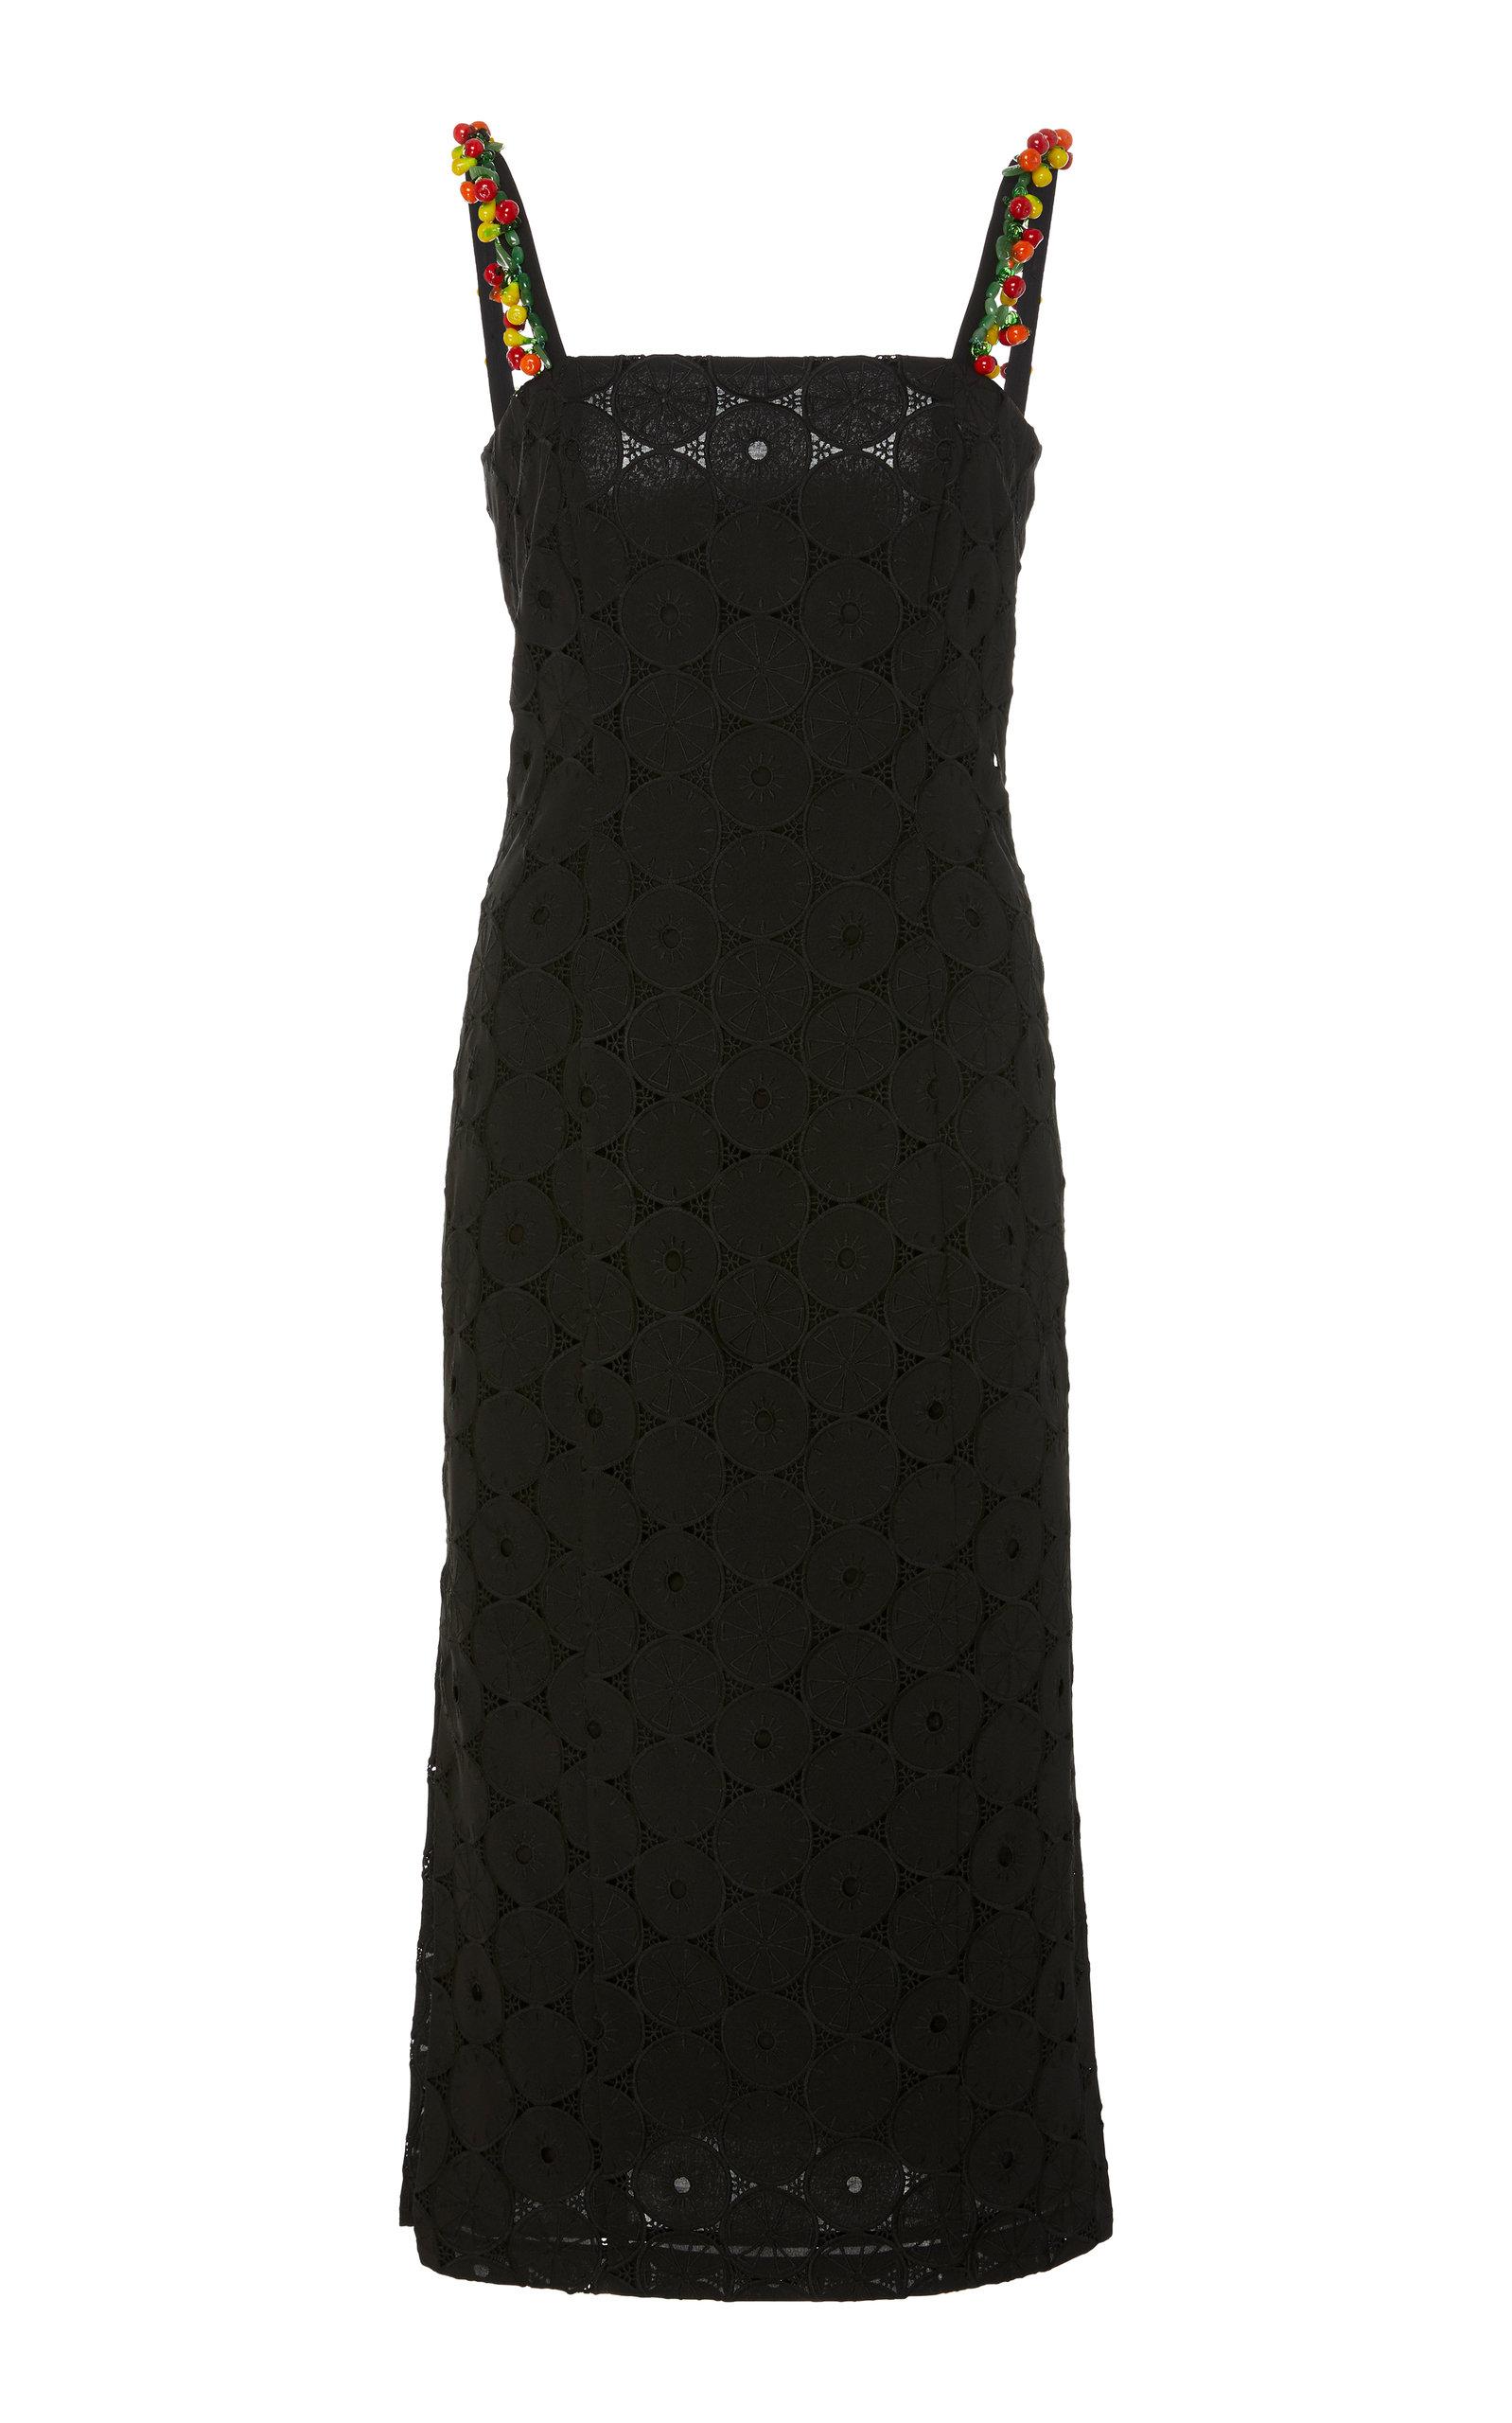 Staud Dresses Cocomaya Broderie Anglaise Cotton Midi Dress